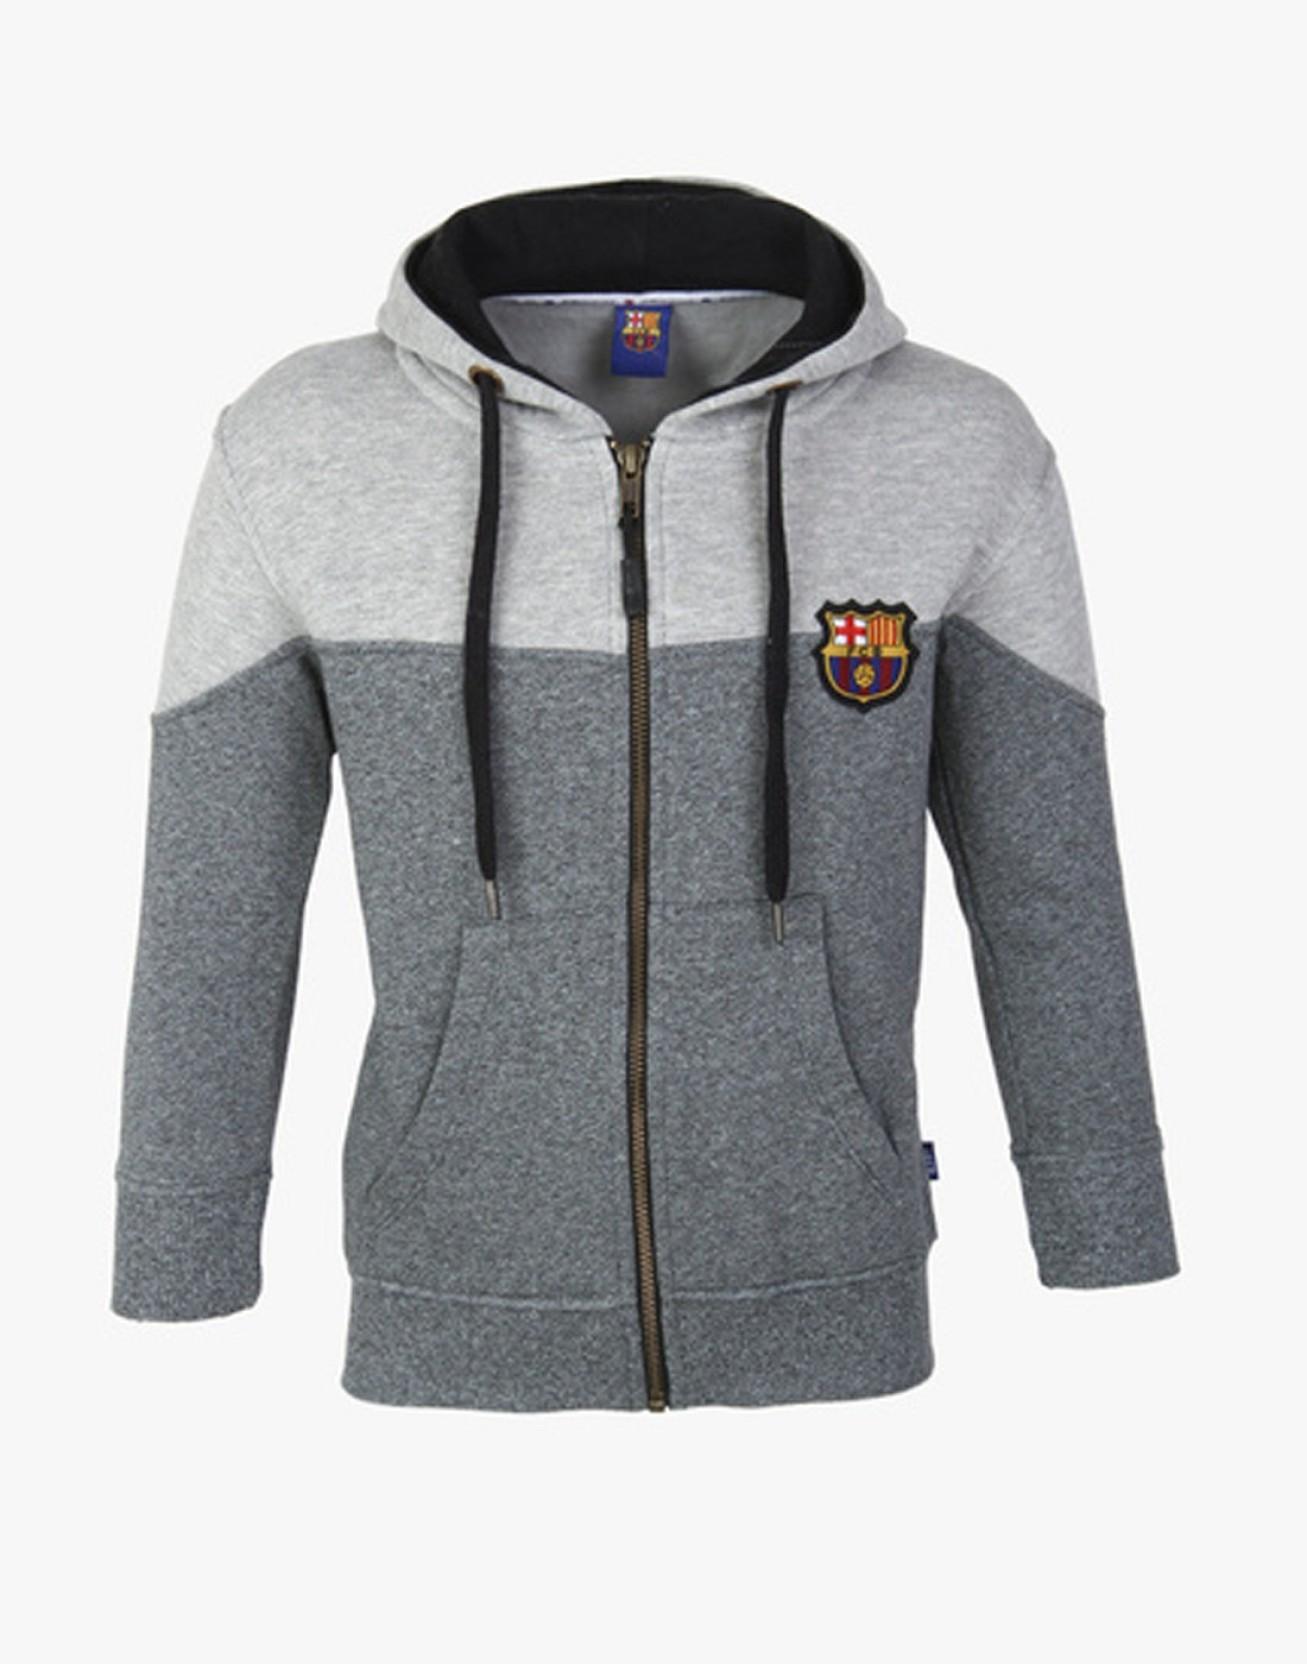 54441486f FC Barcelona Full Sleeve Printed Boys Sweatshirt - Buy FC Barcelona ...